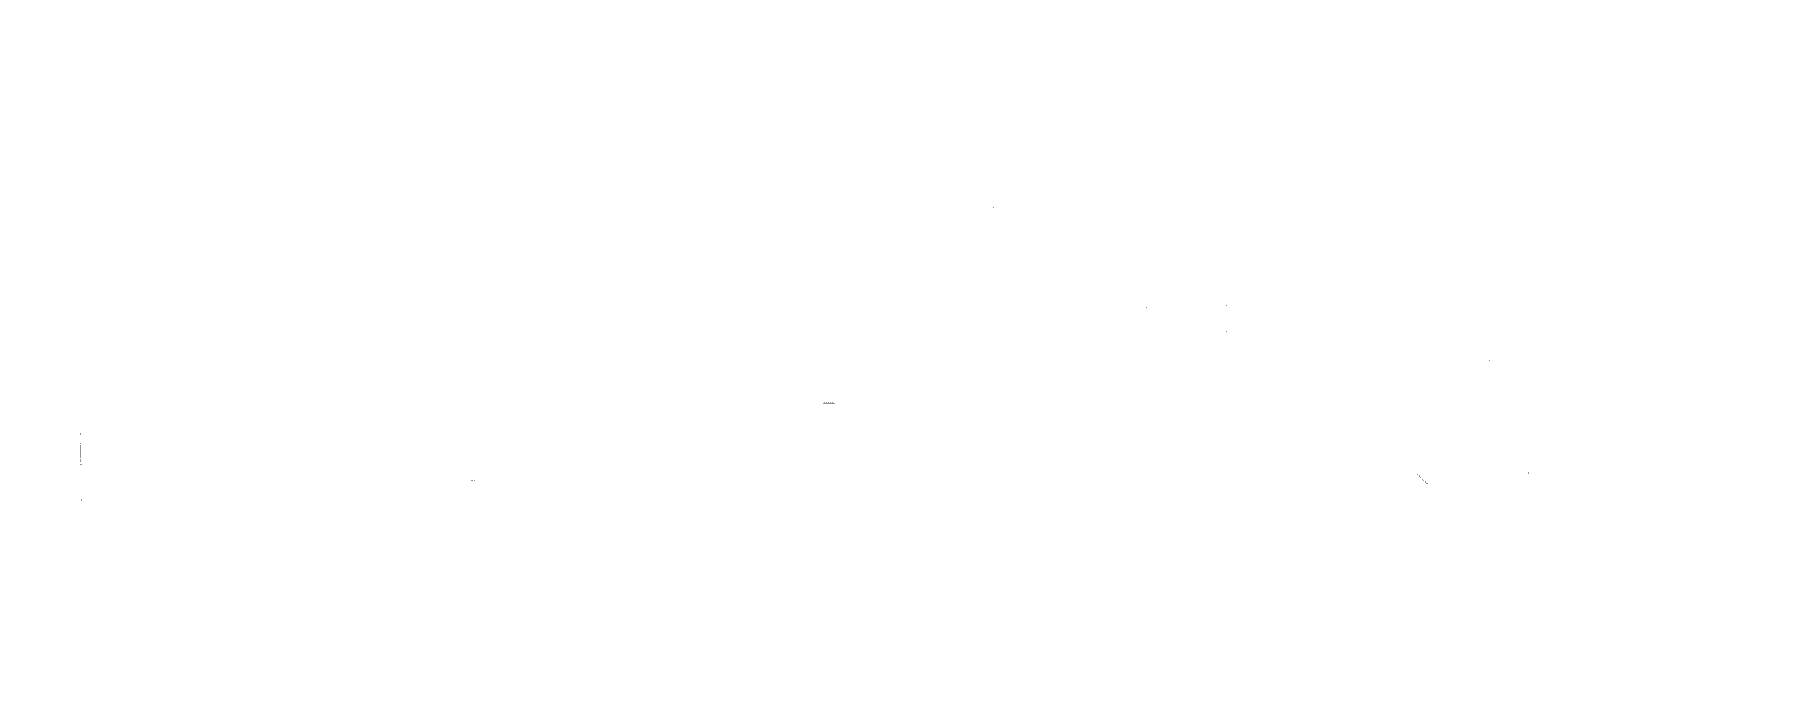 impianto la piattaforma per industria